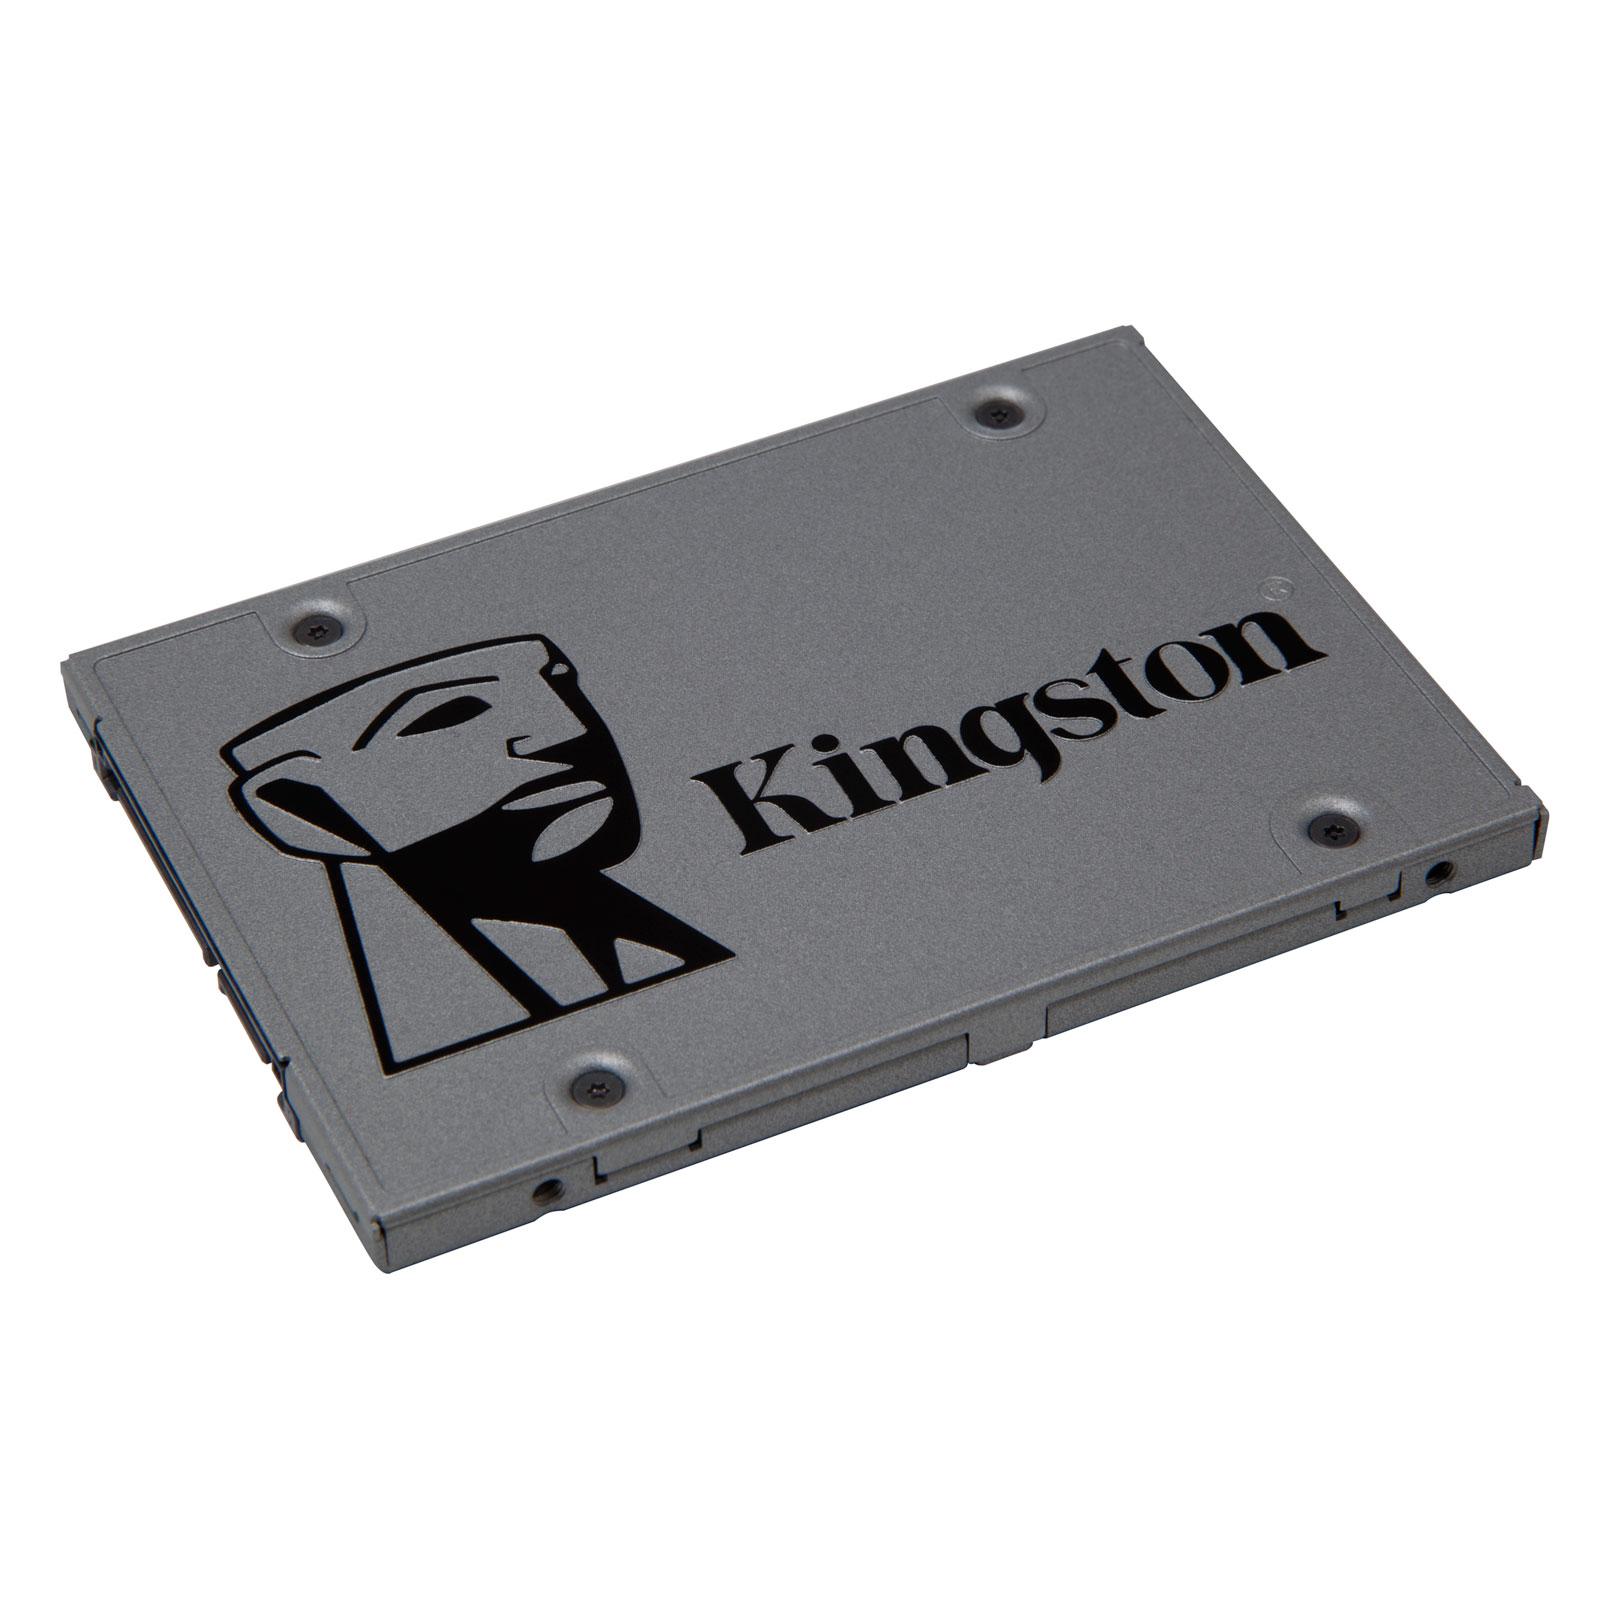 "Disque SSD Kingston SSD UV500 960 Go SSD 960 Go 2.5"" 7mm Serial ATA 6Gb/s"